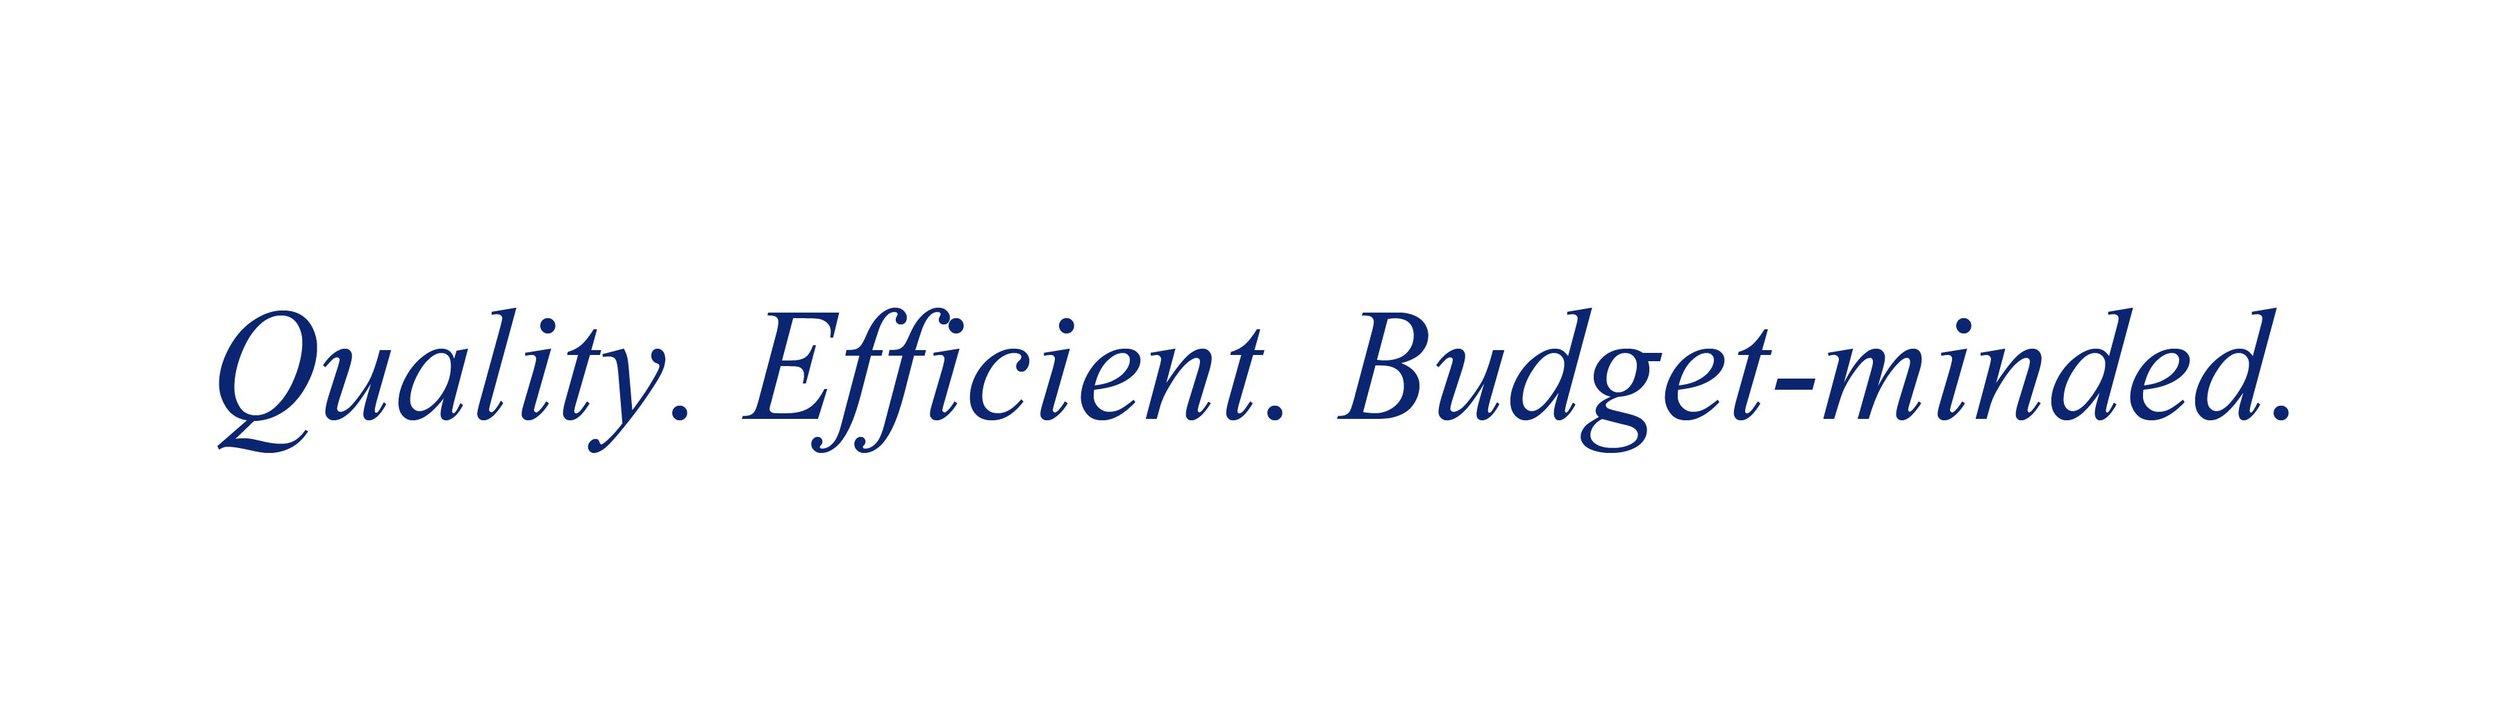 quality, efficient budgetminded.jpg